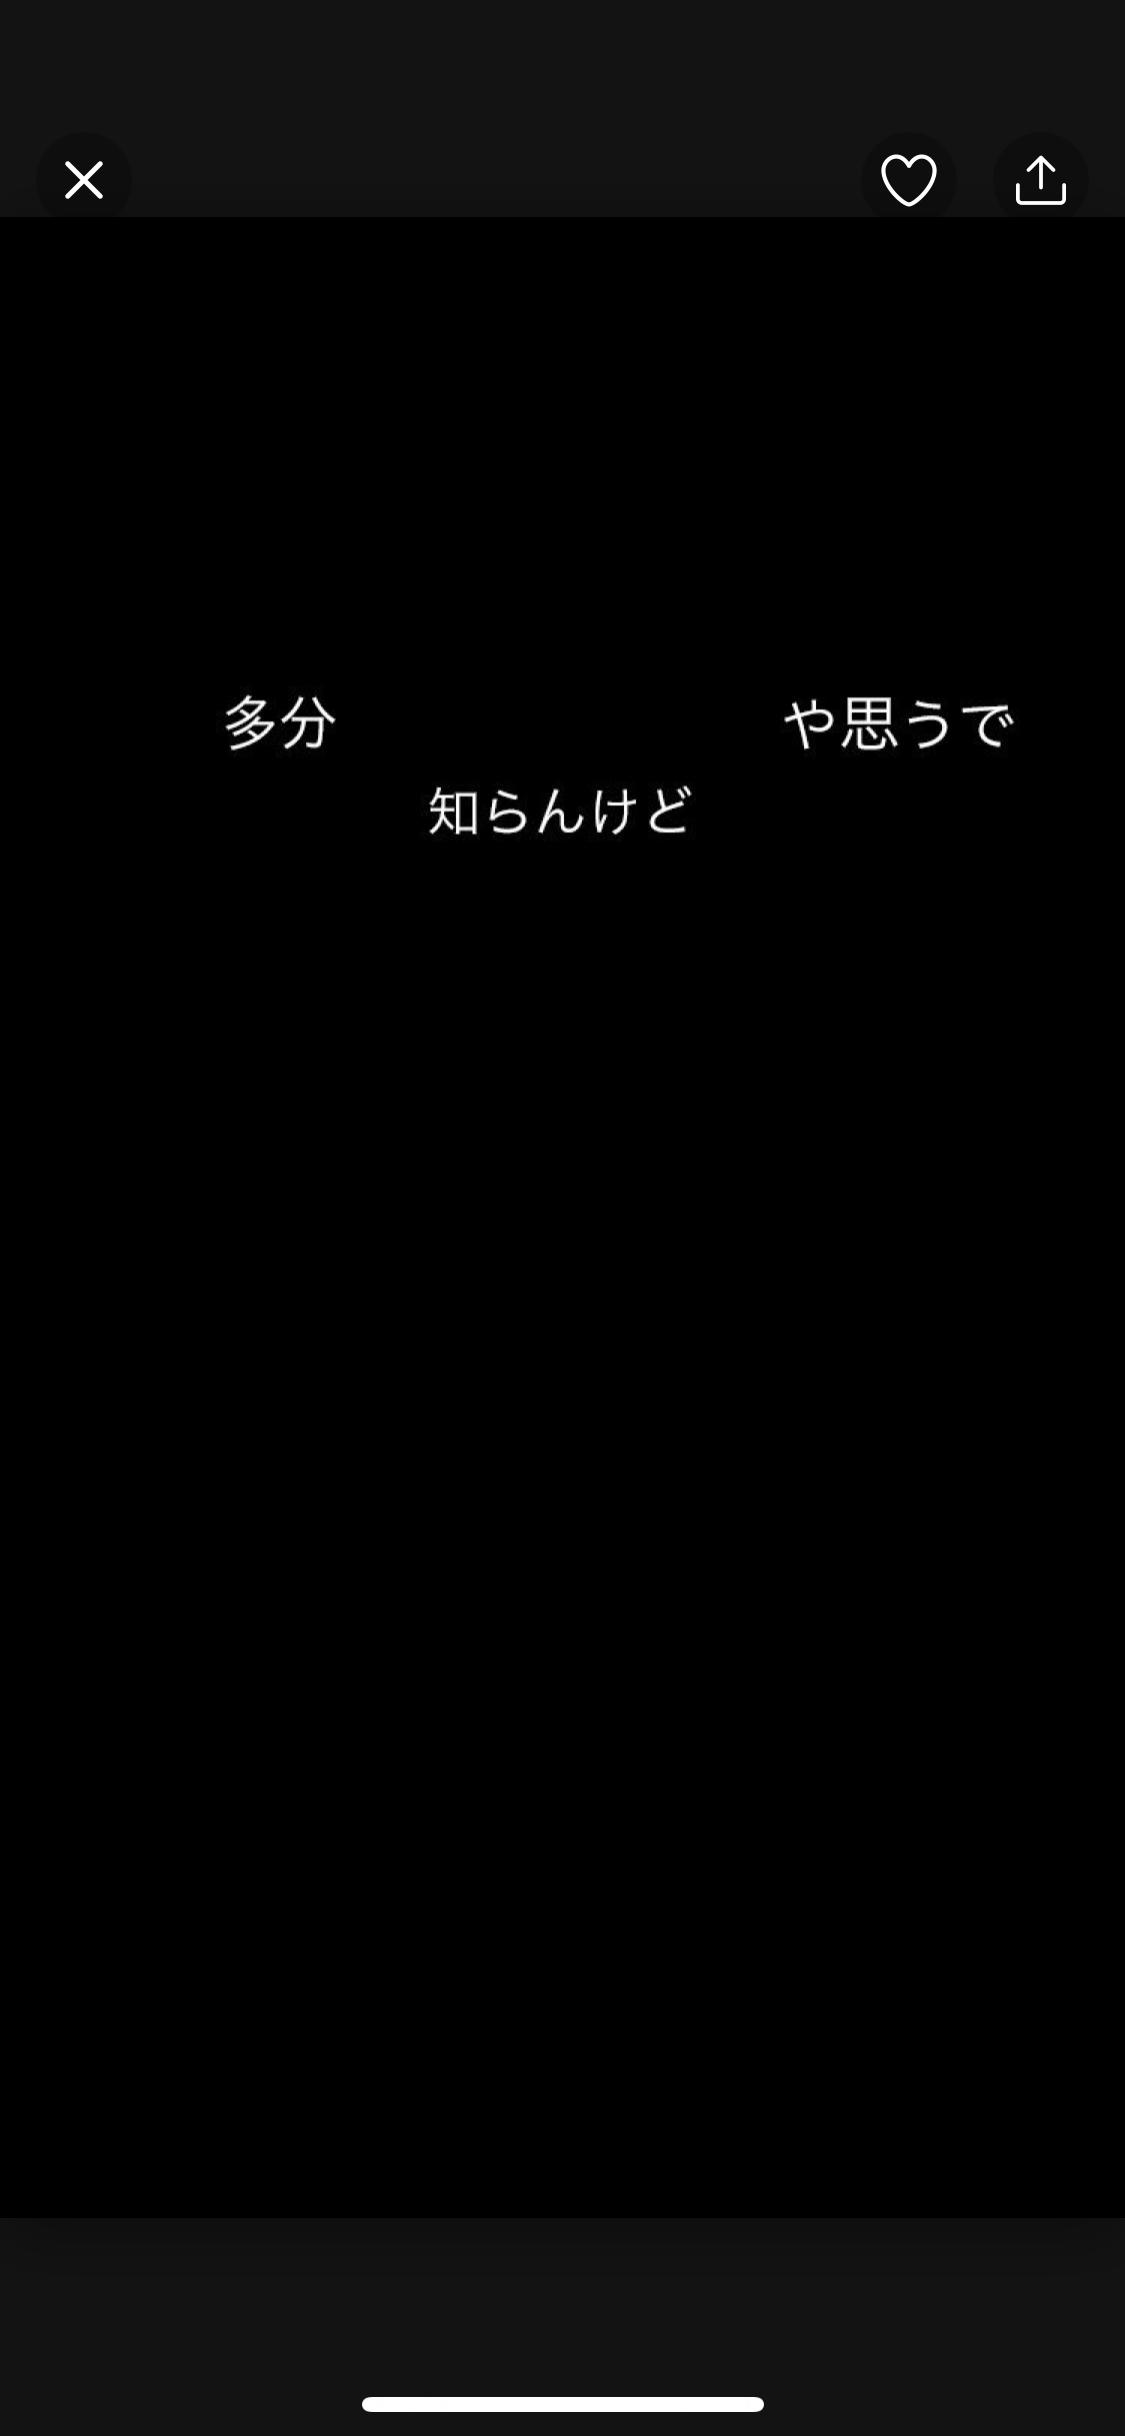 Iphoneが関西人になる壁紙 Iphone修理 遠賀 水巻店